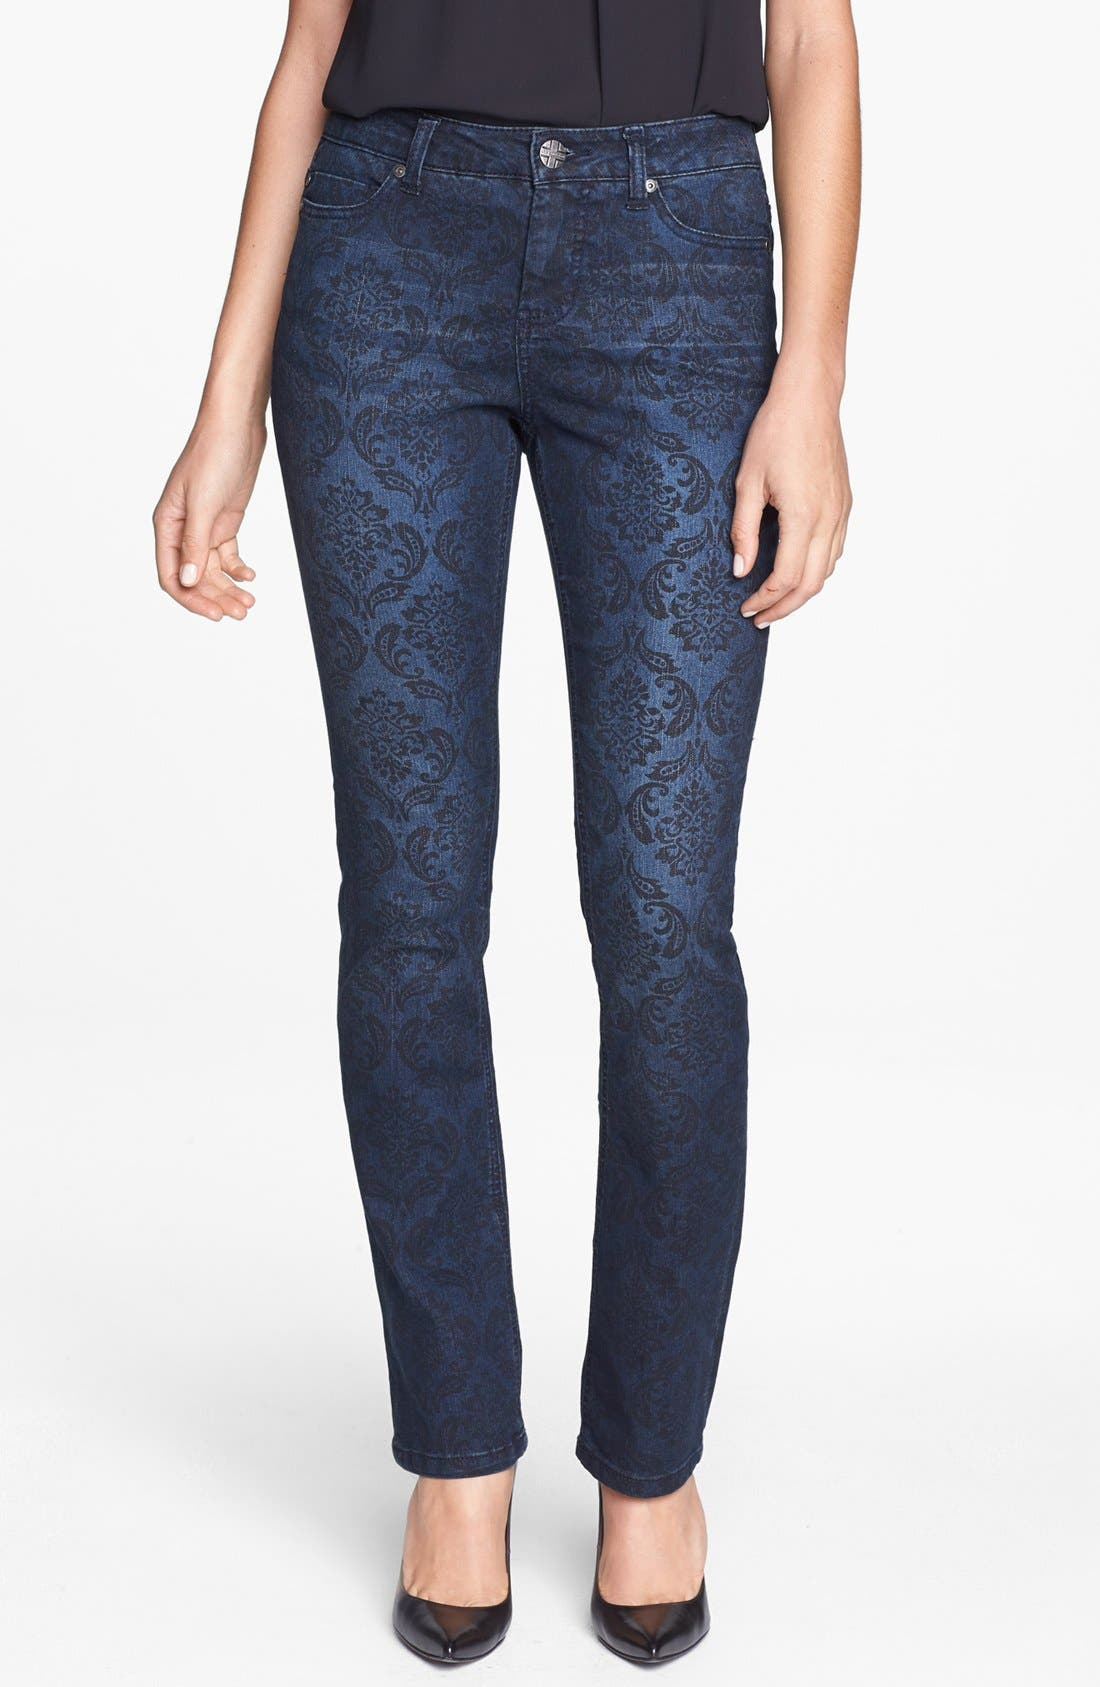 Main Image - Liverpool Jeans Company 'Sadie' Print Straight Leg Jeans